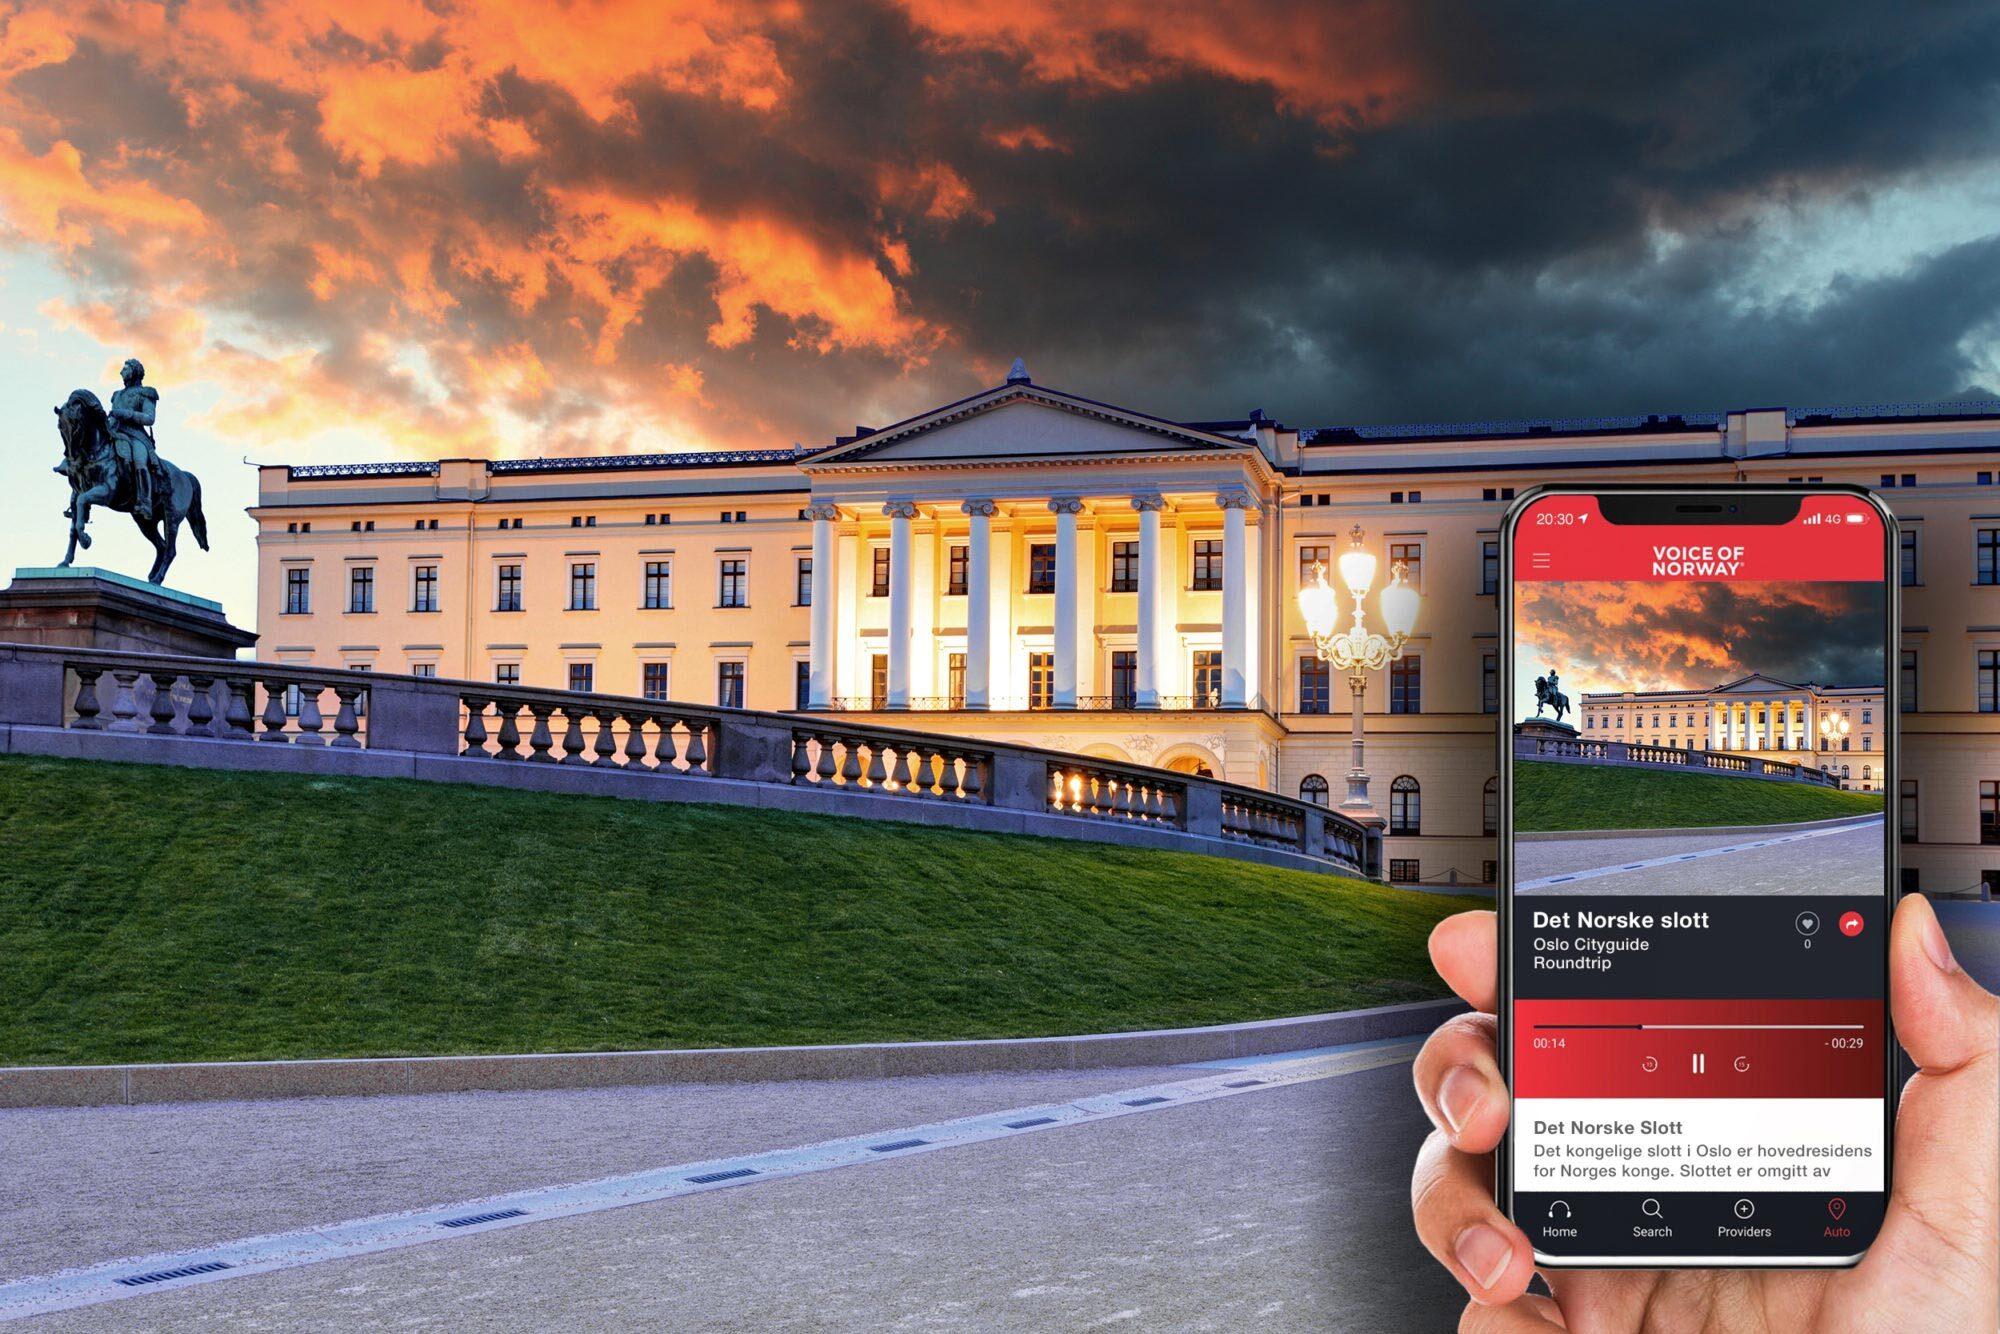 Slottet-audioguide-lydguide-reiseguide-app-voice-of-norway-turistapp-norge-reiseapp-Oslo